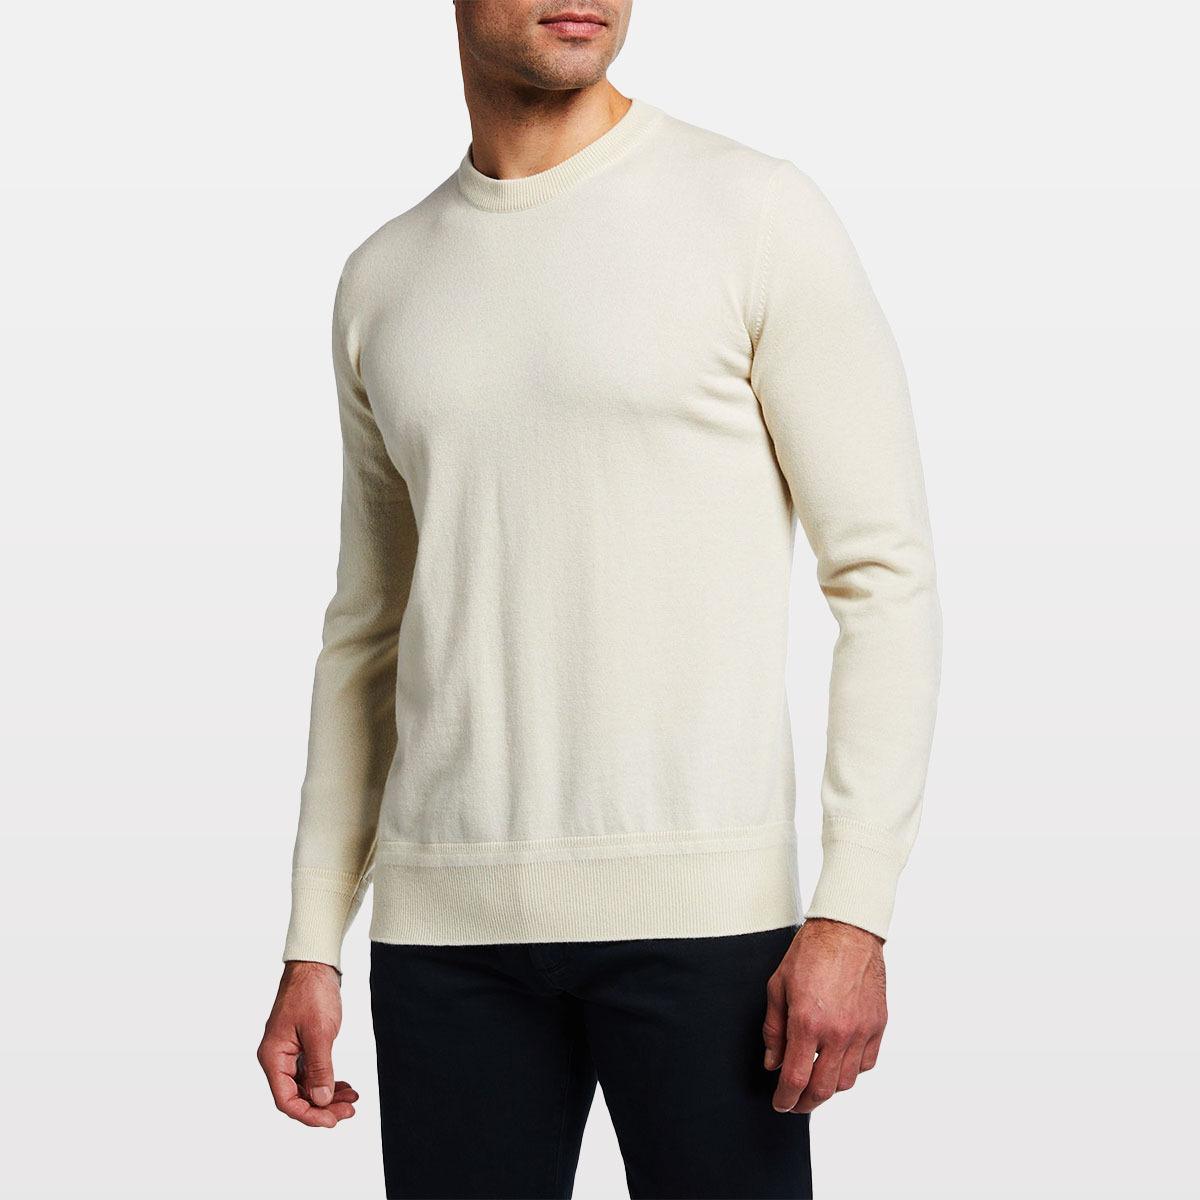 Loro Piana Castlebay Crewneck Cashmere Sweater neiman marcus